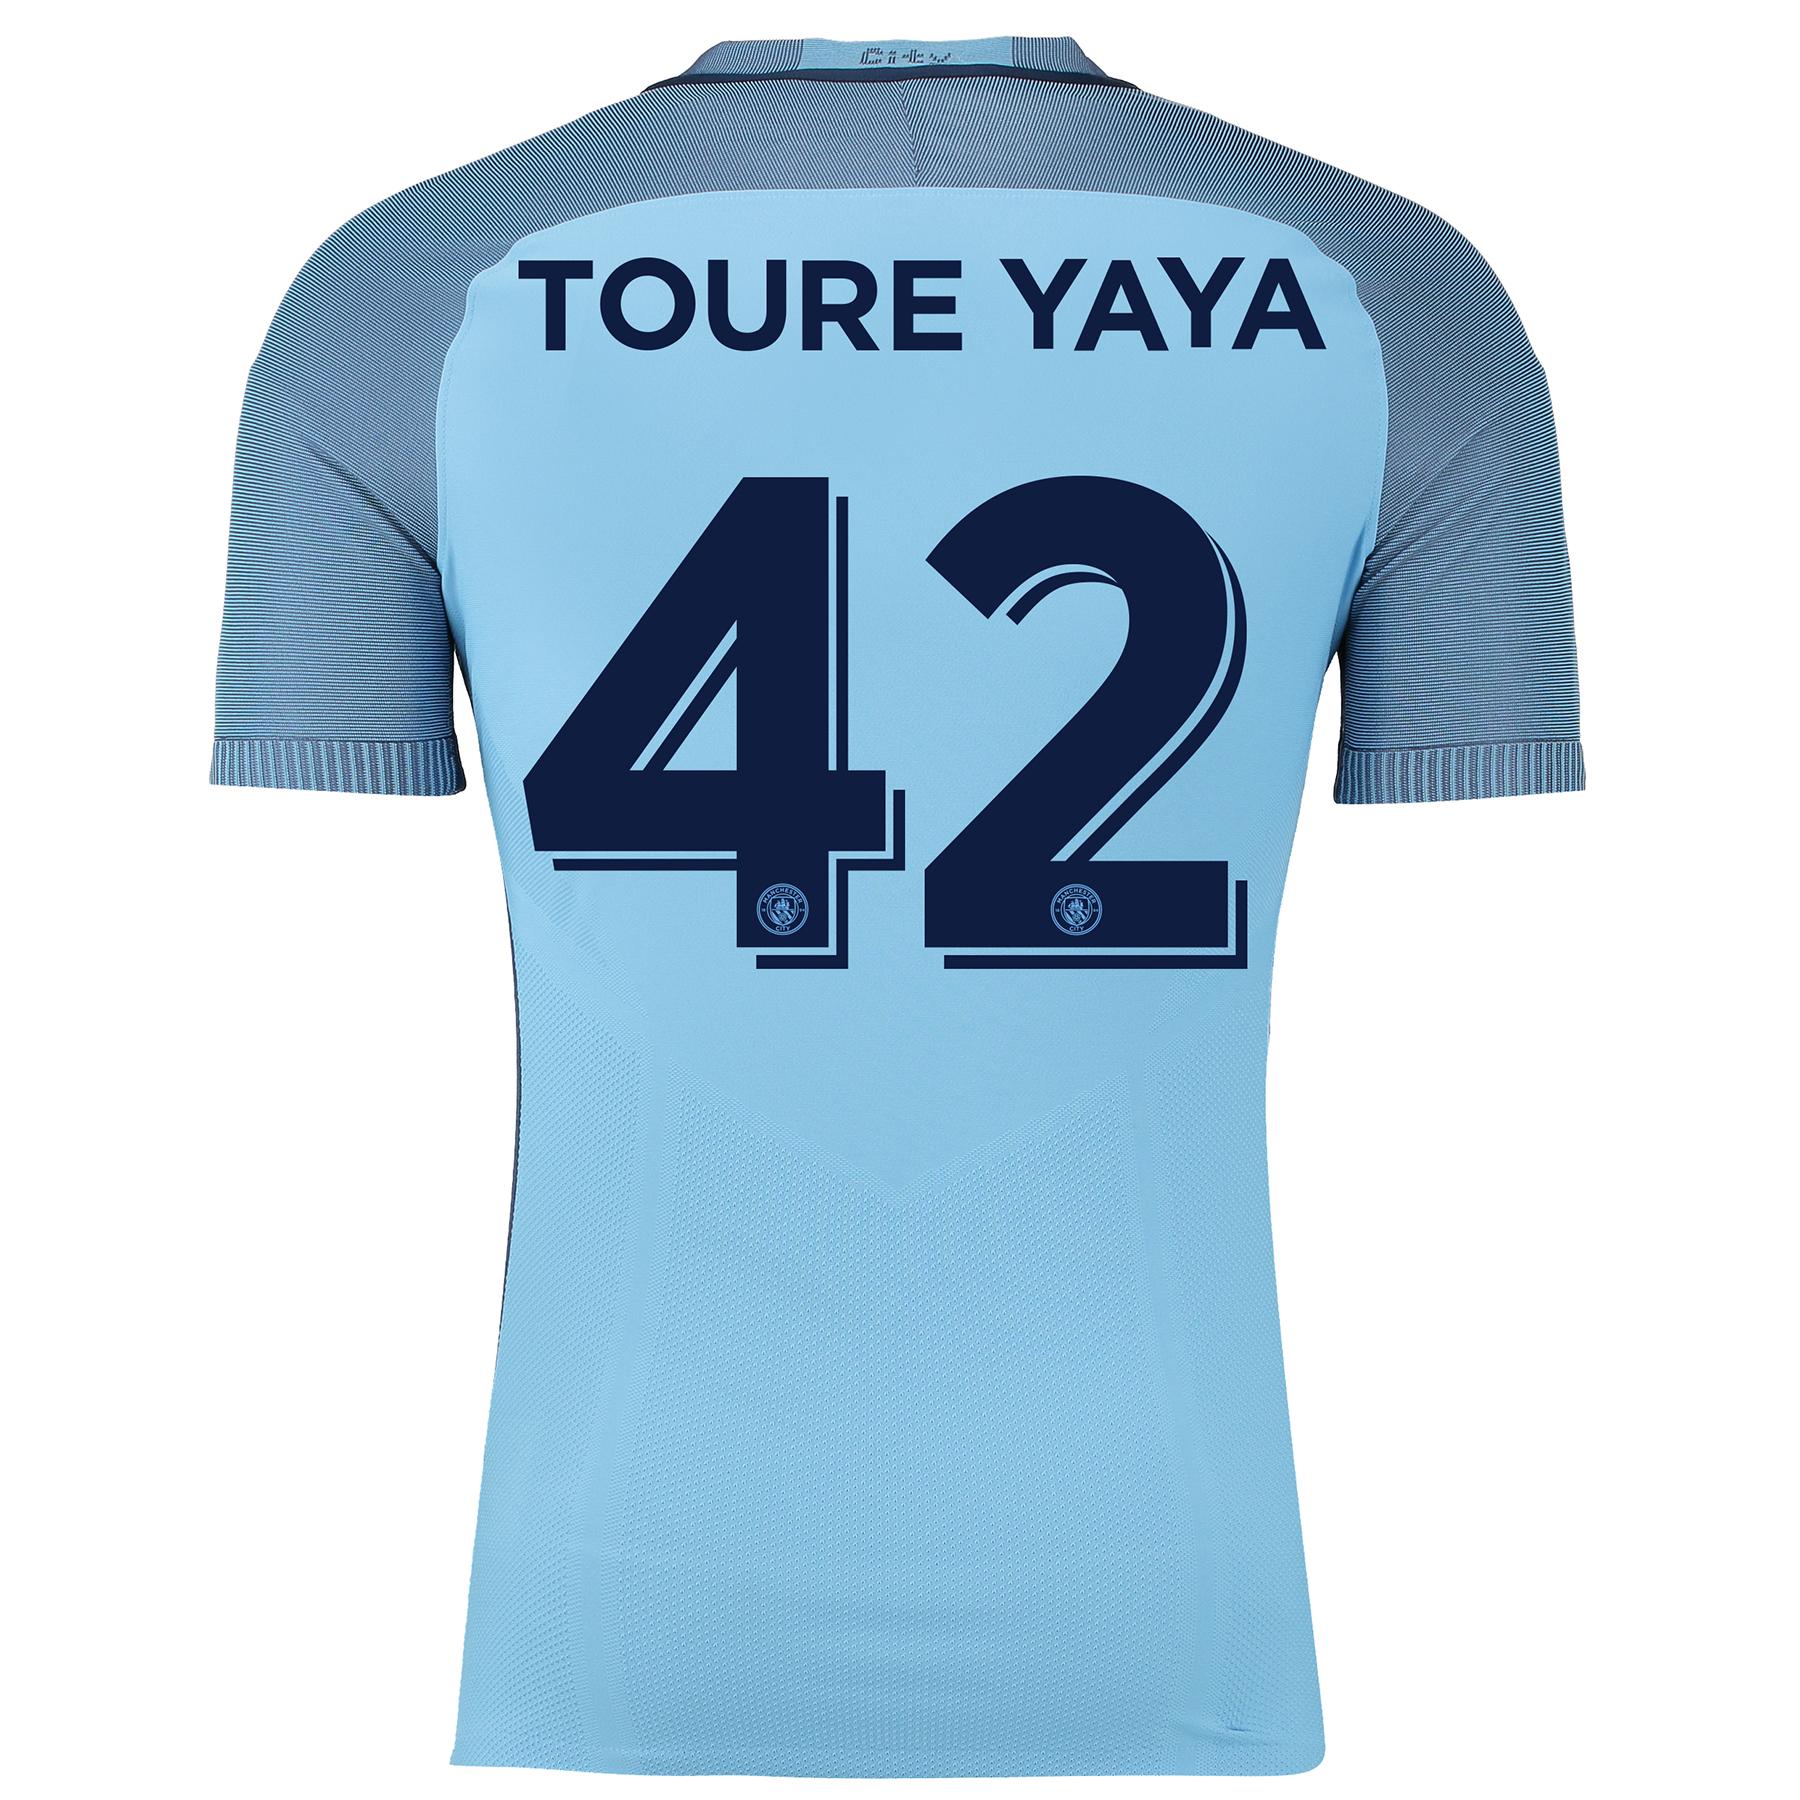 Manchester City Home Cup Match Shirt 2016-17 with Toure Yaya 42 printi